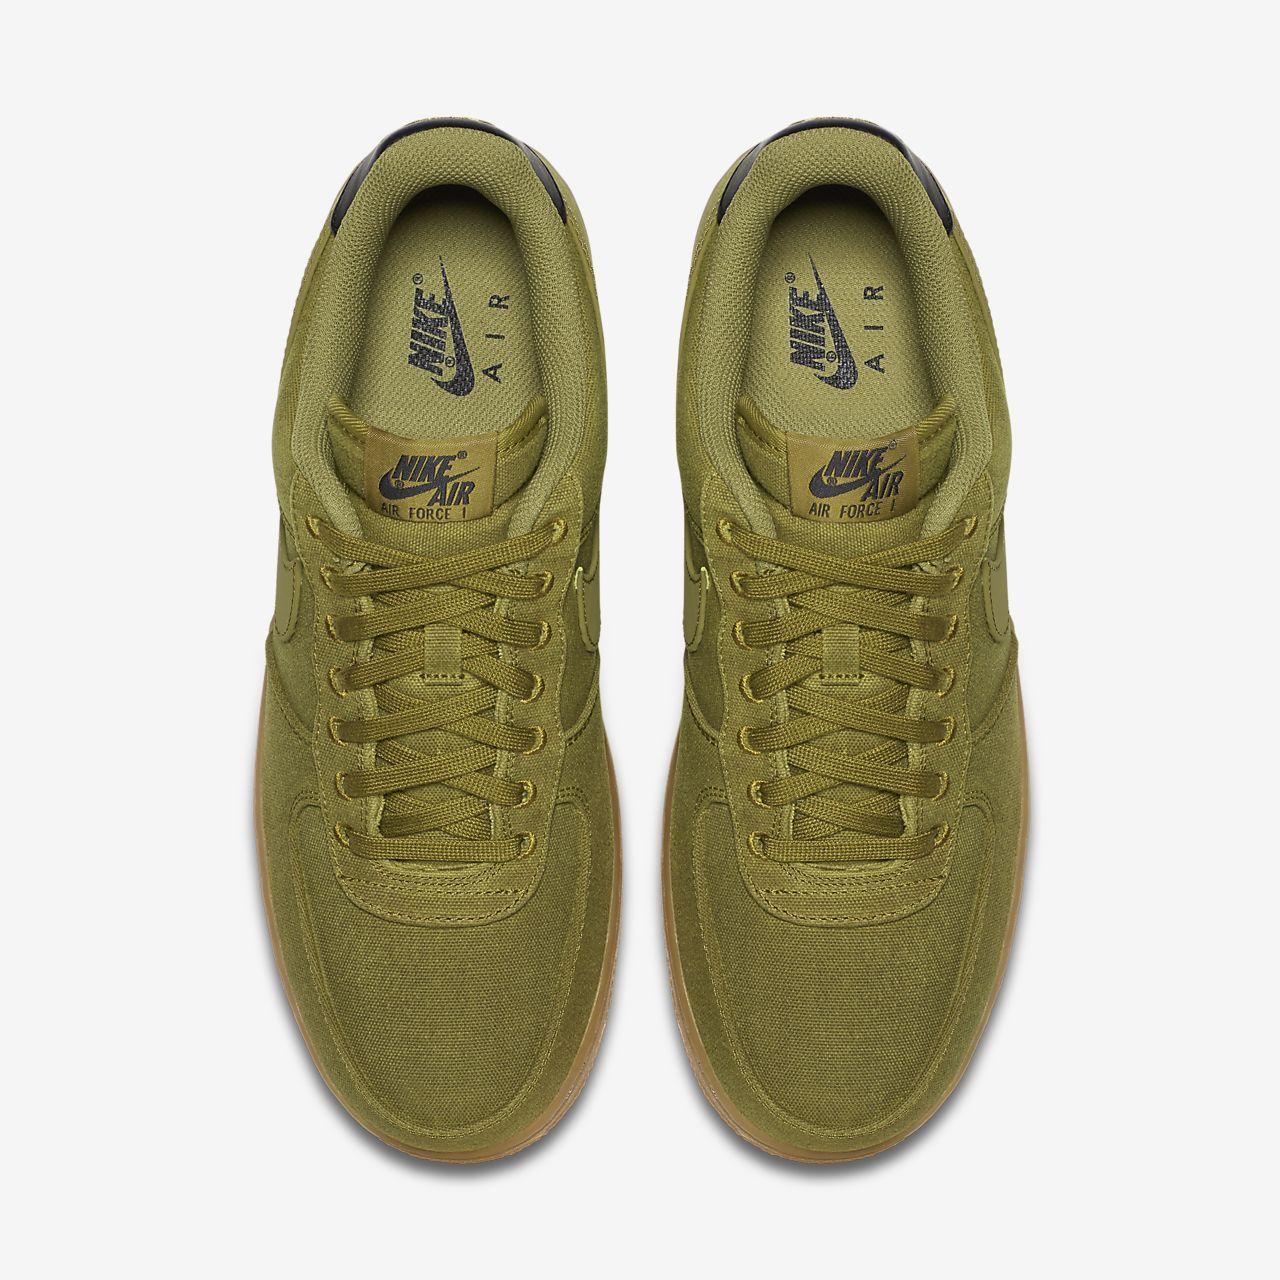 f74720ddc Nike Air Force 1 '07 LV8 Style Men's Shoe. Nike.com DK